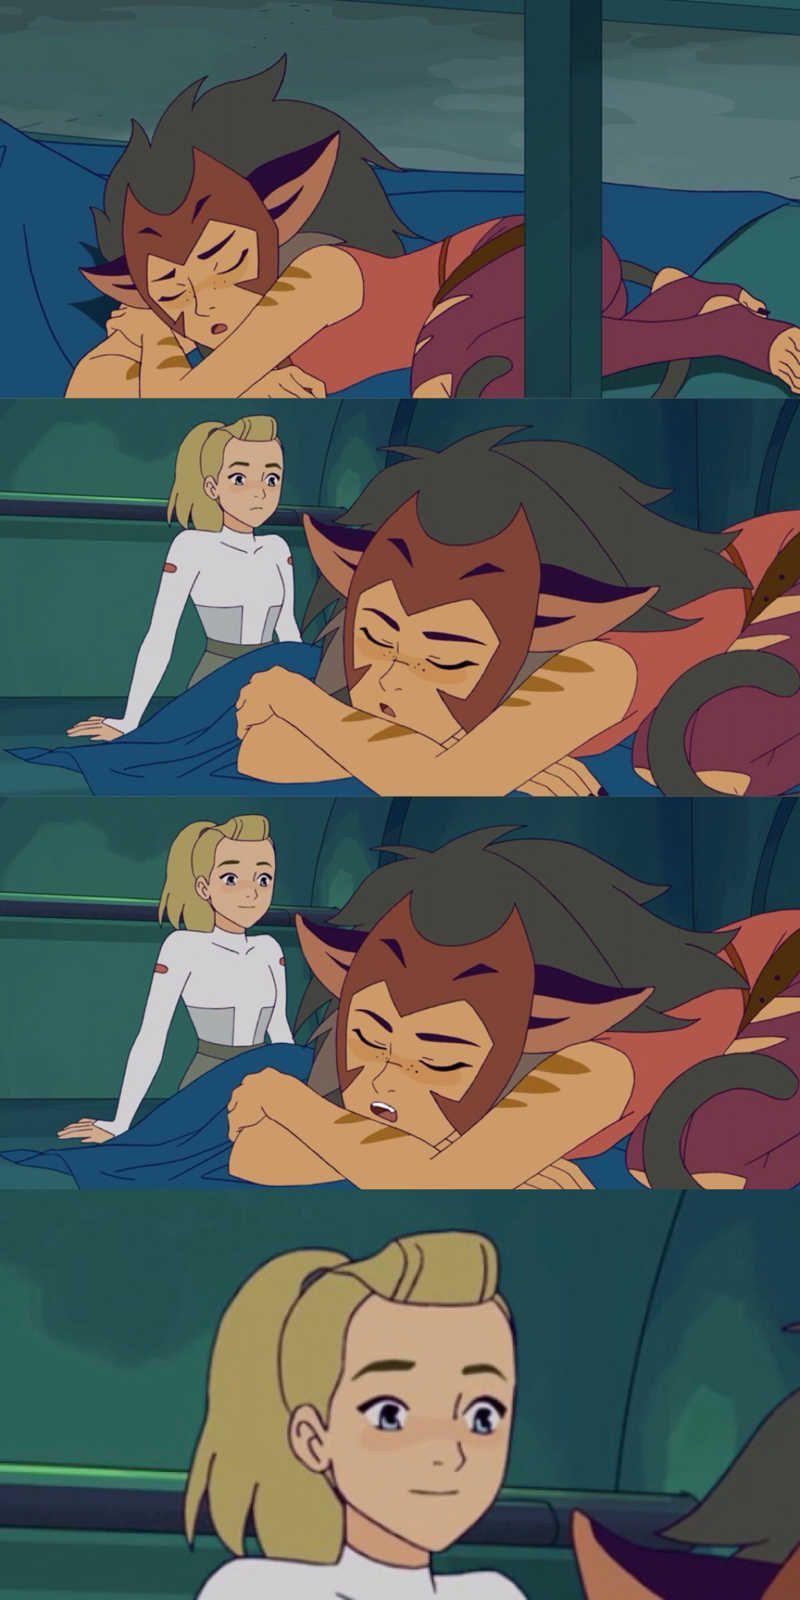 She-Ra and the Princesses of Power - S01E01